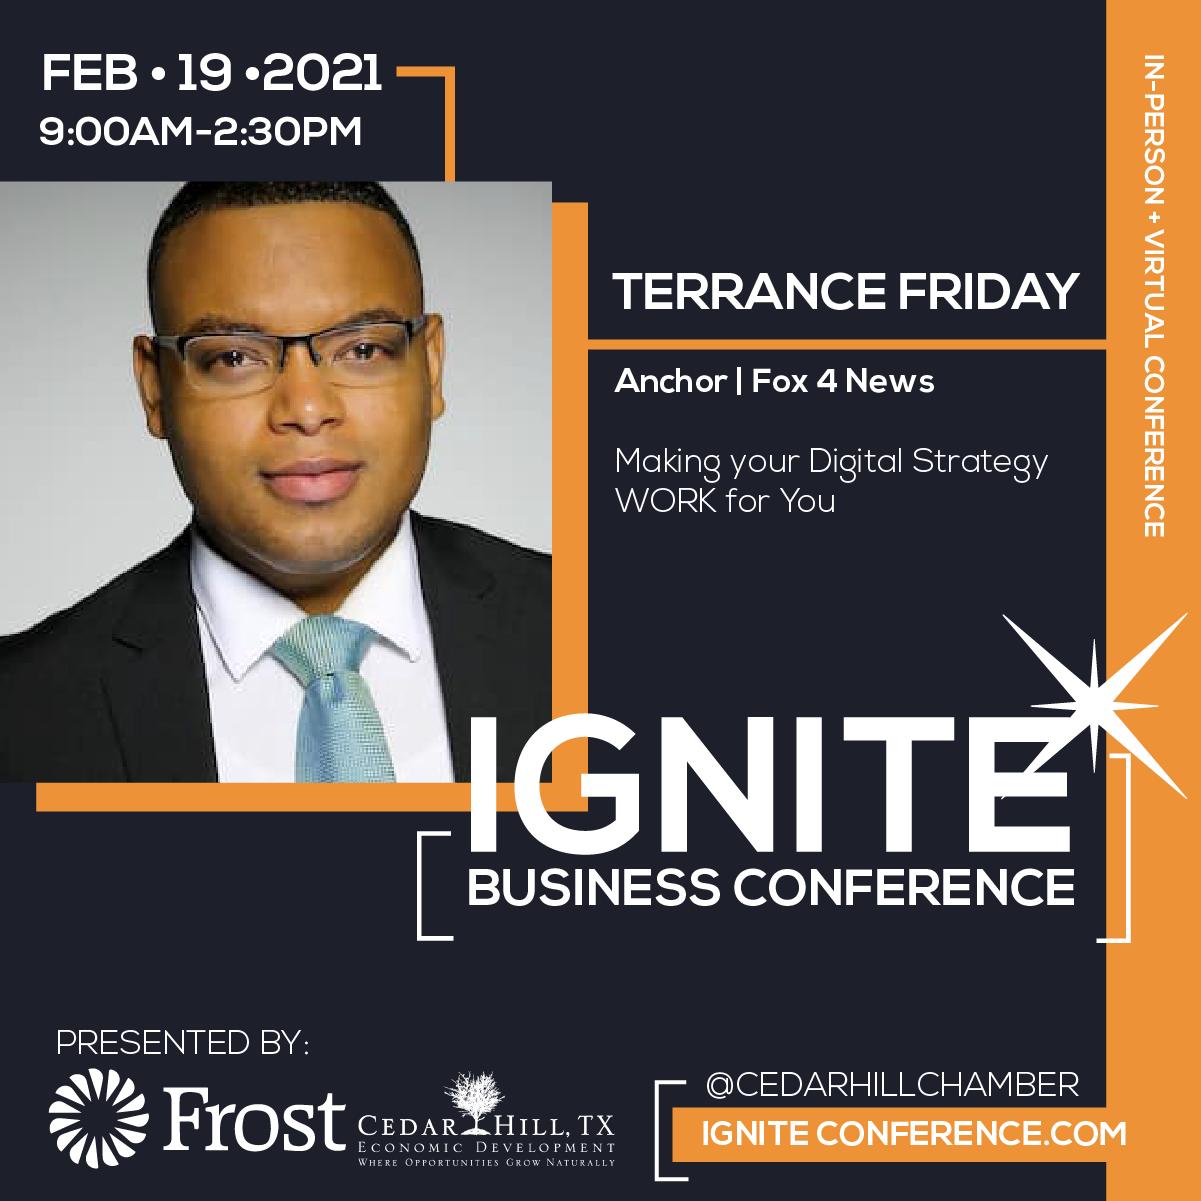 Ignite_SpeakerSocials_TerranceFriday.png